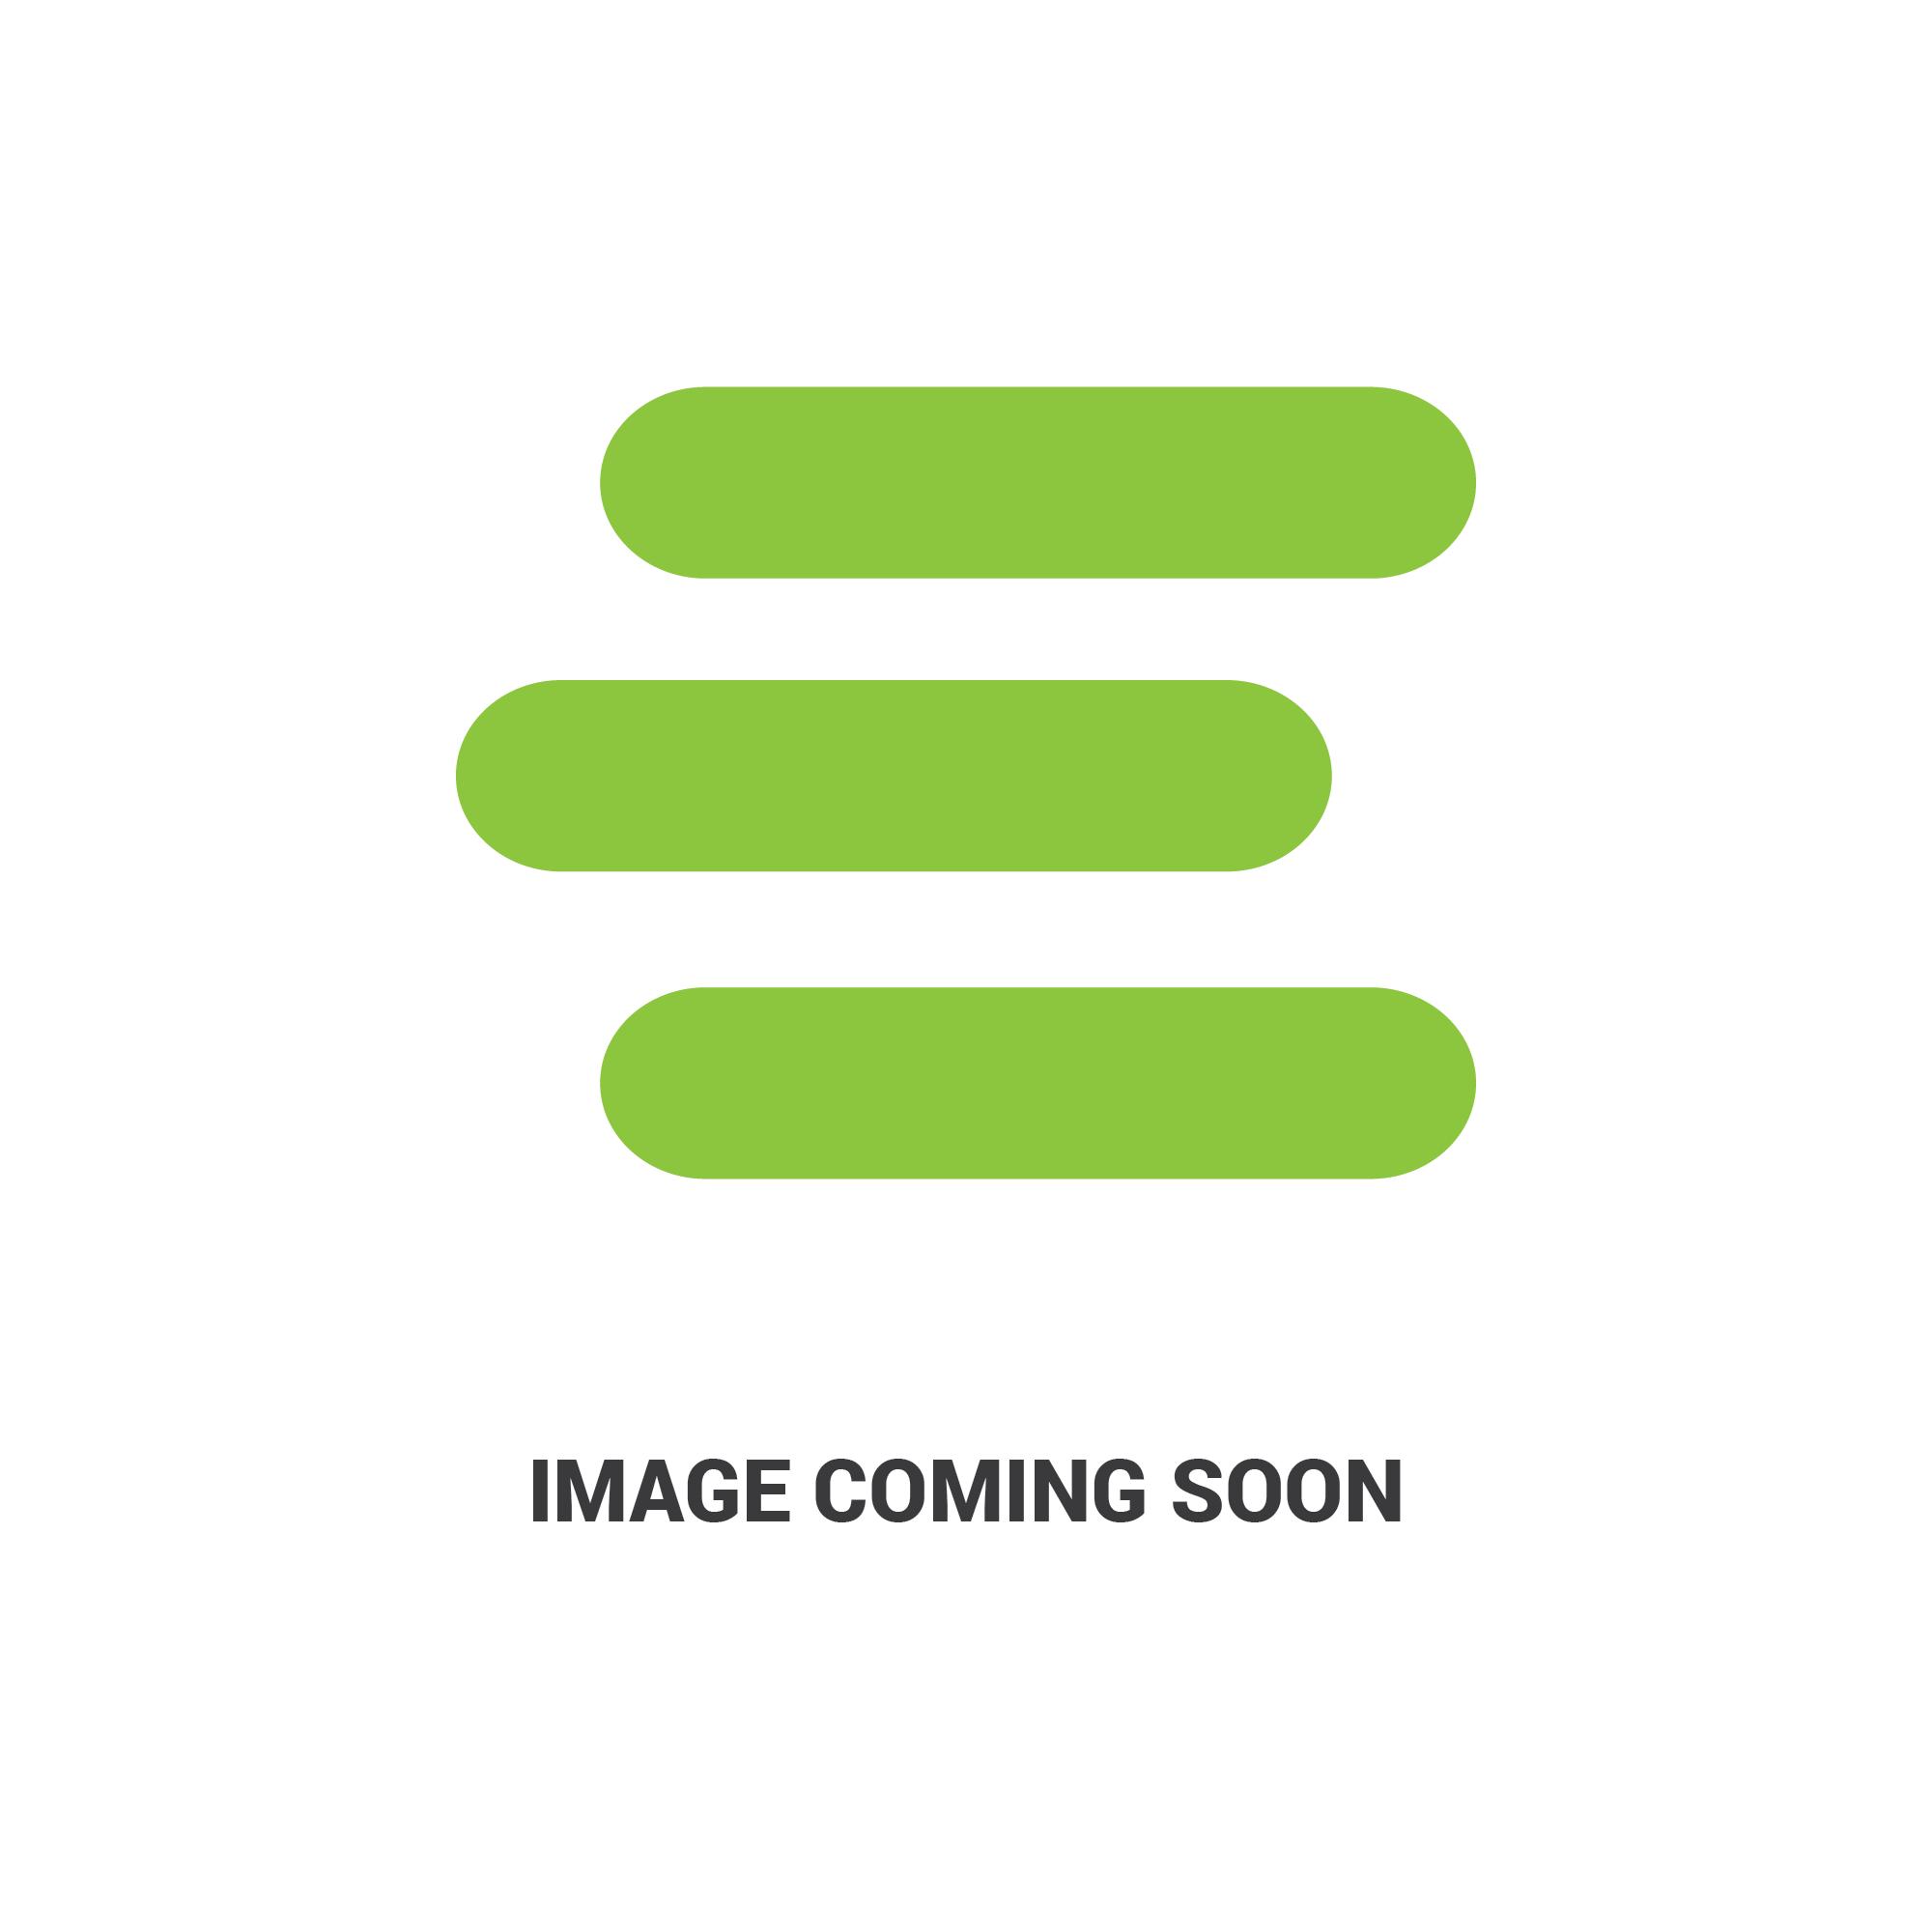 E-6690143edit 1.jpg